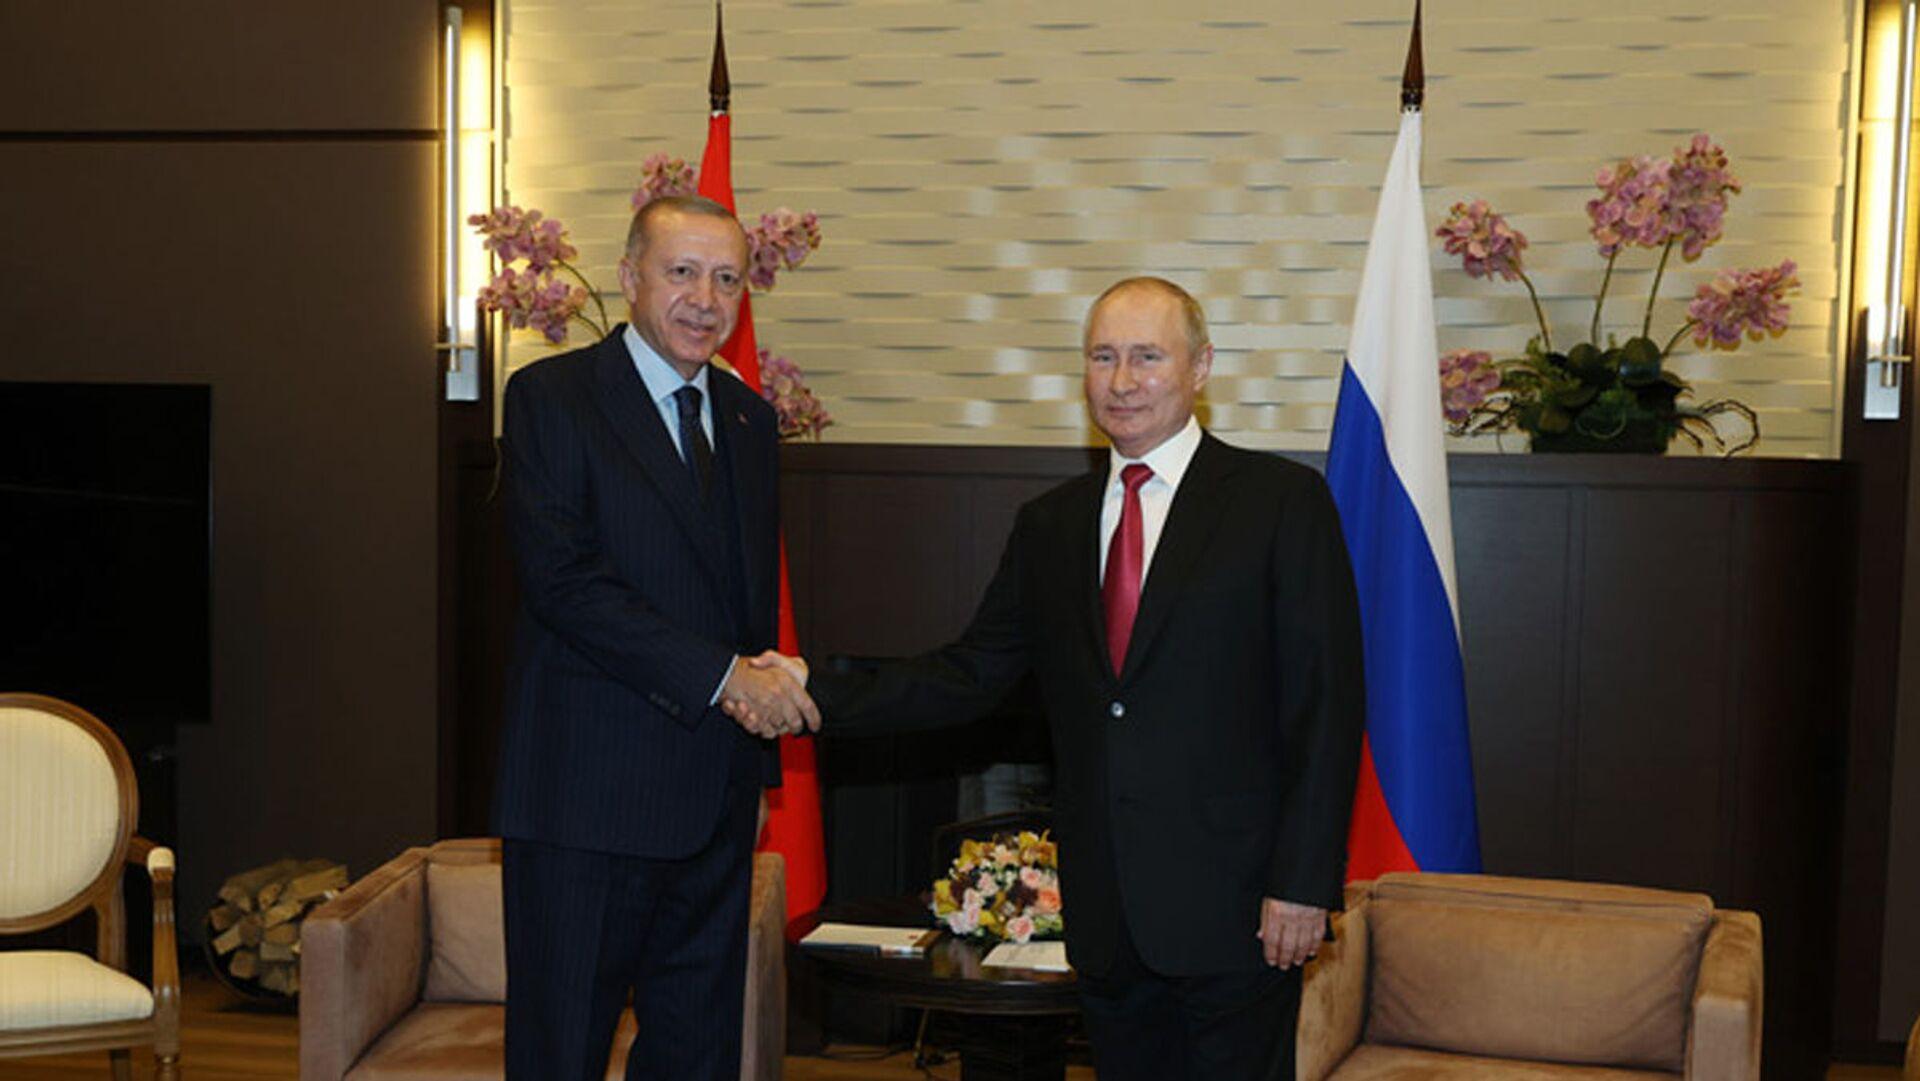 Incontro di Putin e Erdogan a Sochi - Sputnik Italia, 1920, 29.09.2021